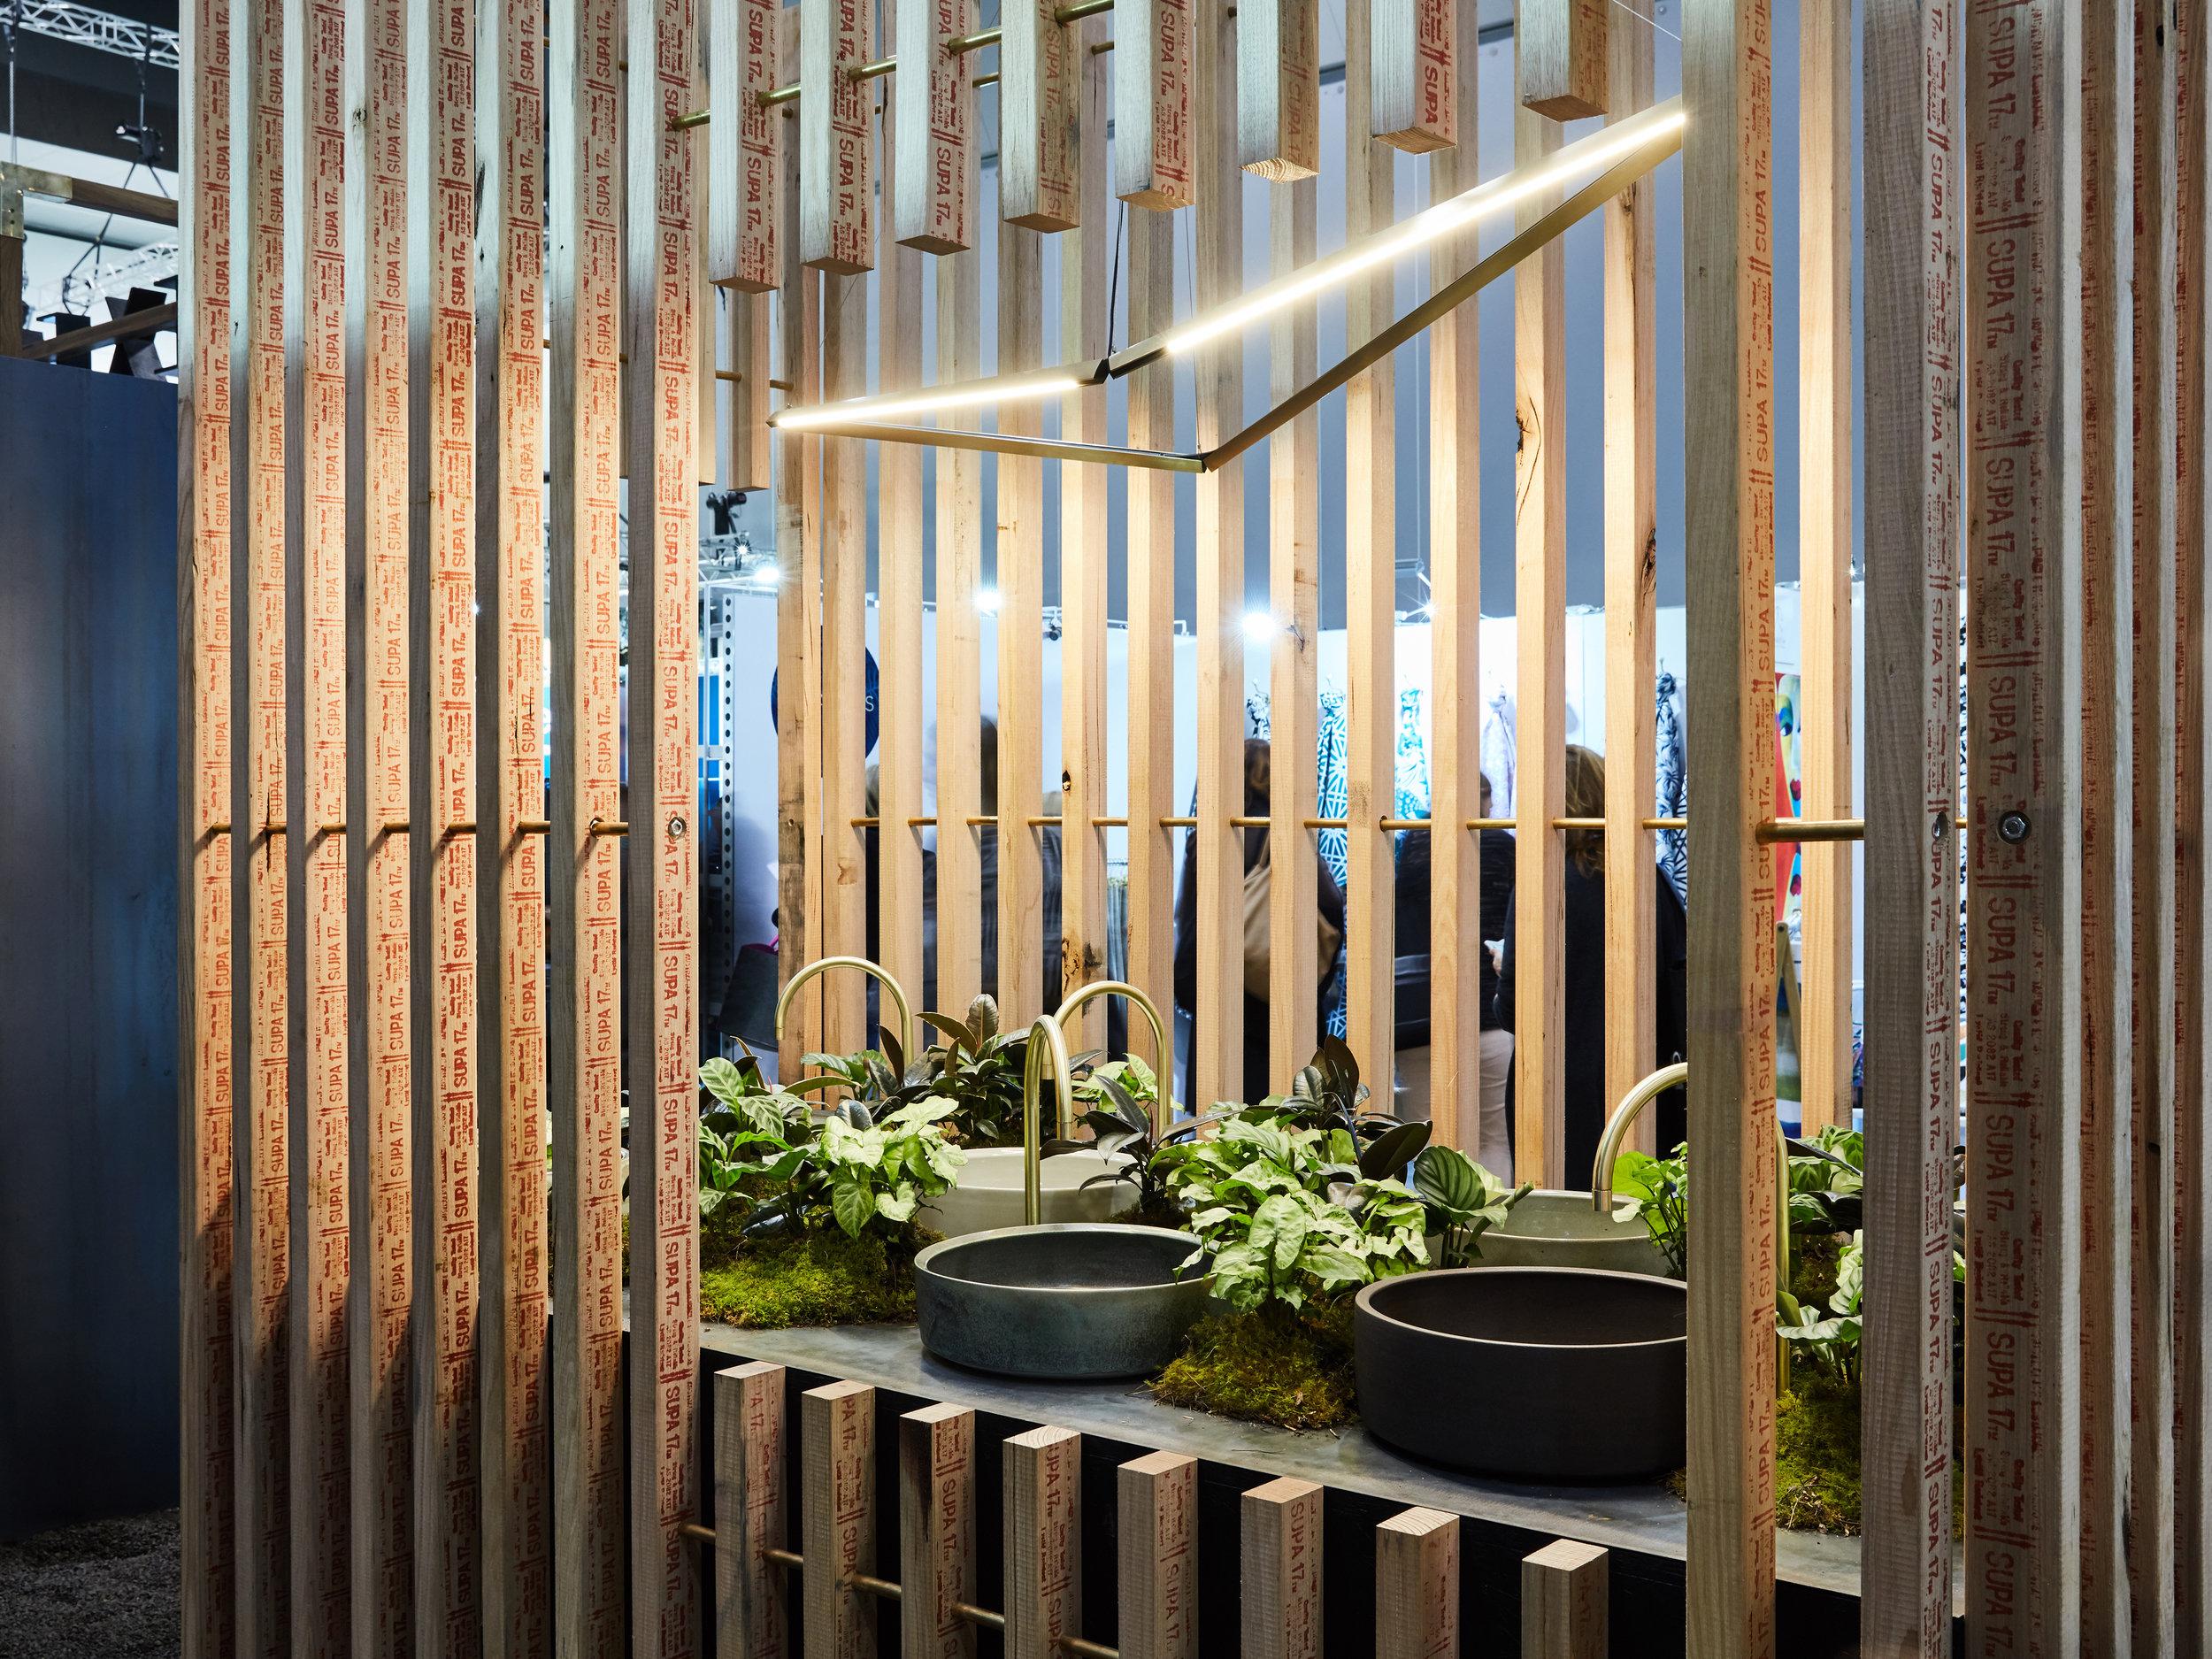 The+Plant+Society_Jason+Chongue_Nathan+Smith_Plant+Cultivators_Melbourne+Australia_Photo+01_Archier_Denfair01.jpg